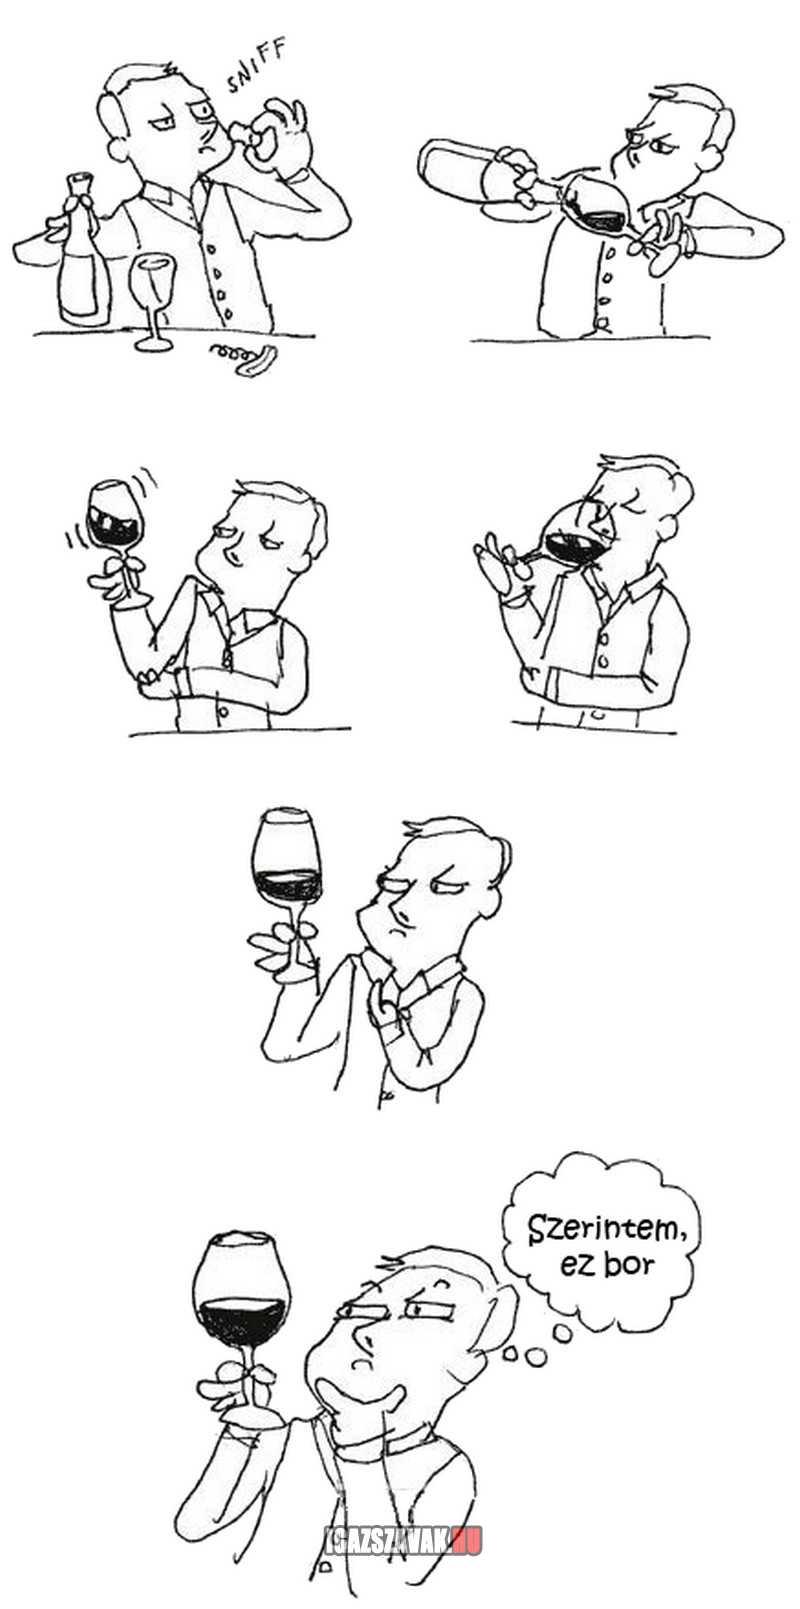 amikor bort kóstolok